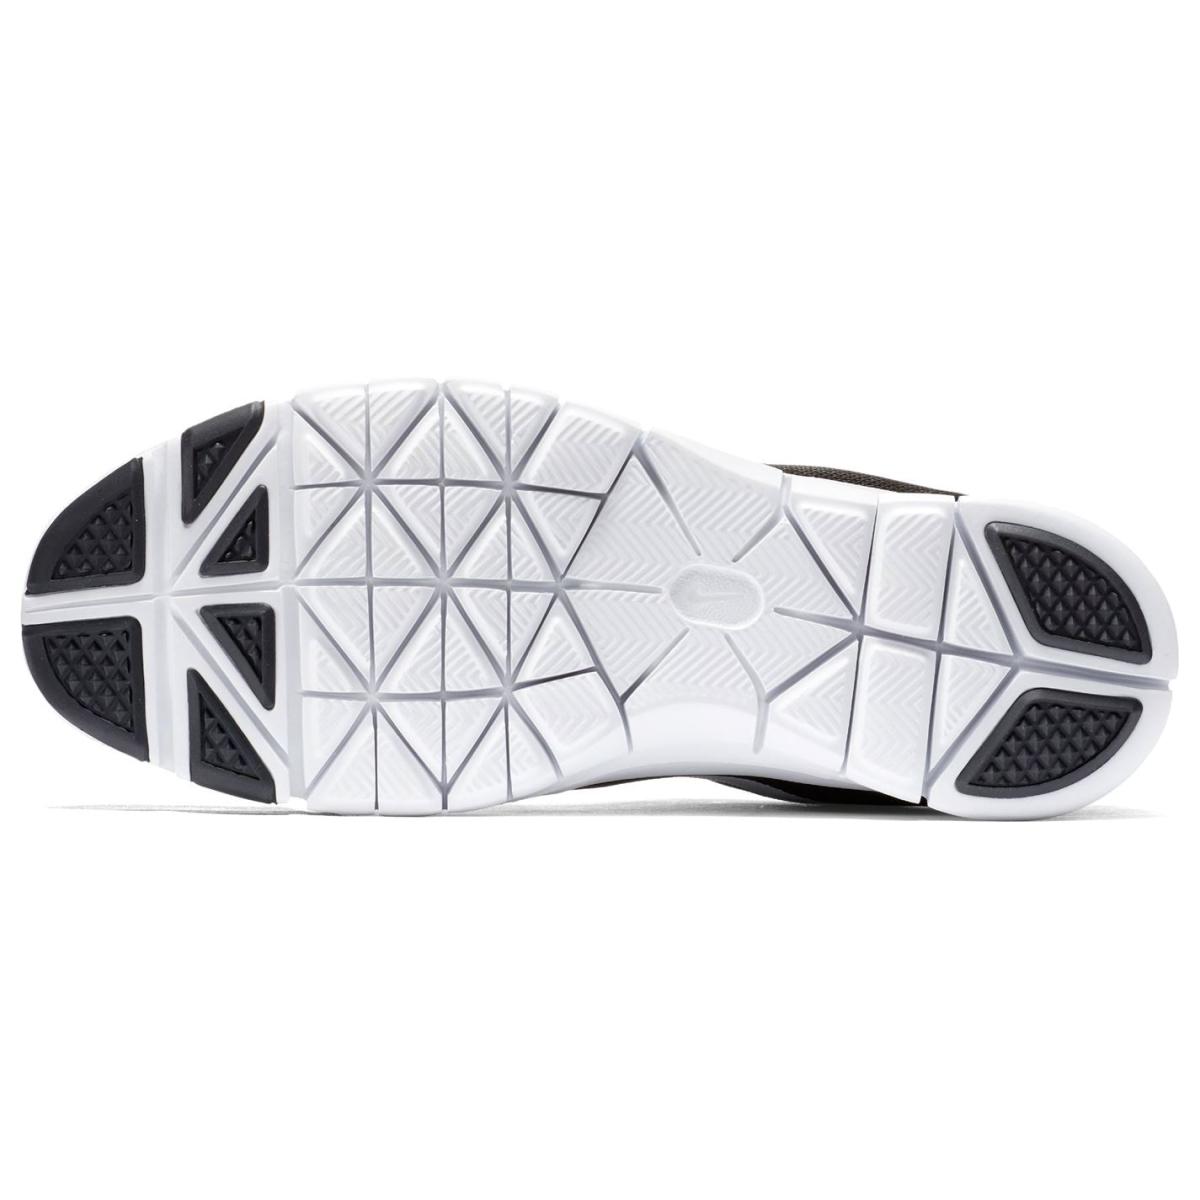 Nike-Flex-Laufschuhe-Turnschuhe-Damen-Sneaker-Sportschuhe-Jogging-3088 Indexbild 7